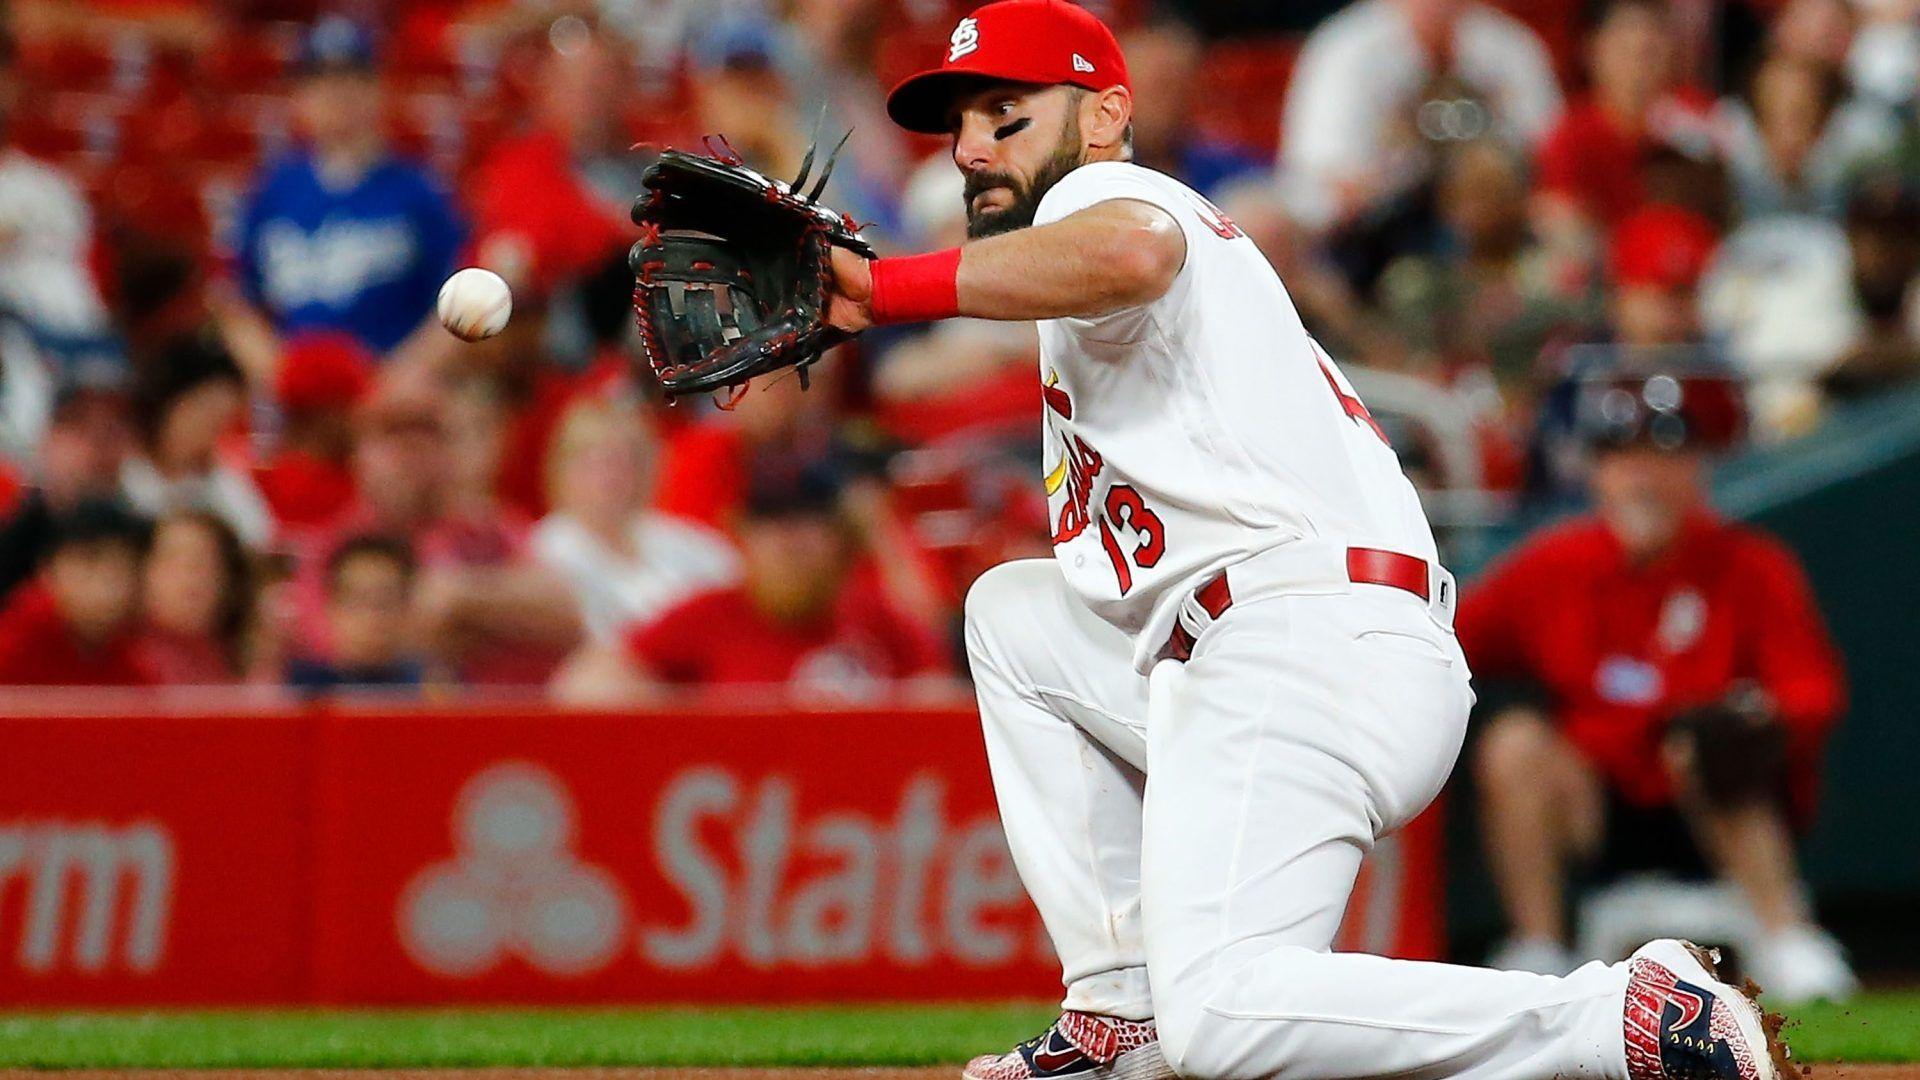 Cardinals sign Matt Carpenter to two year 39 million contract 1920x1080